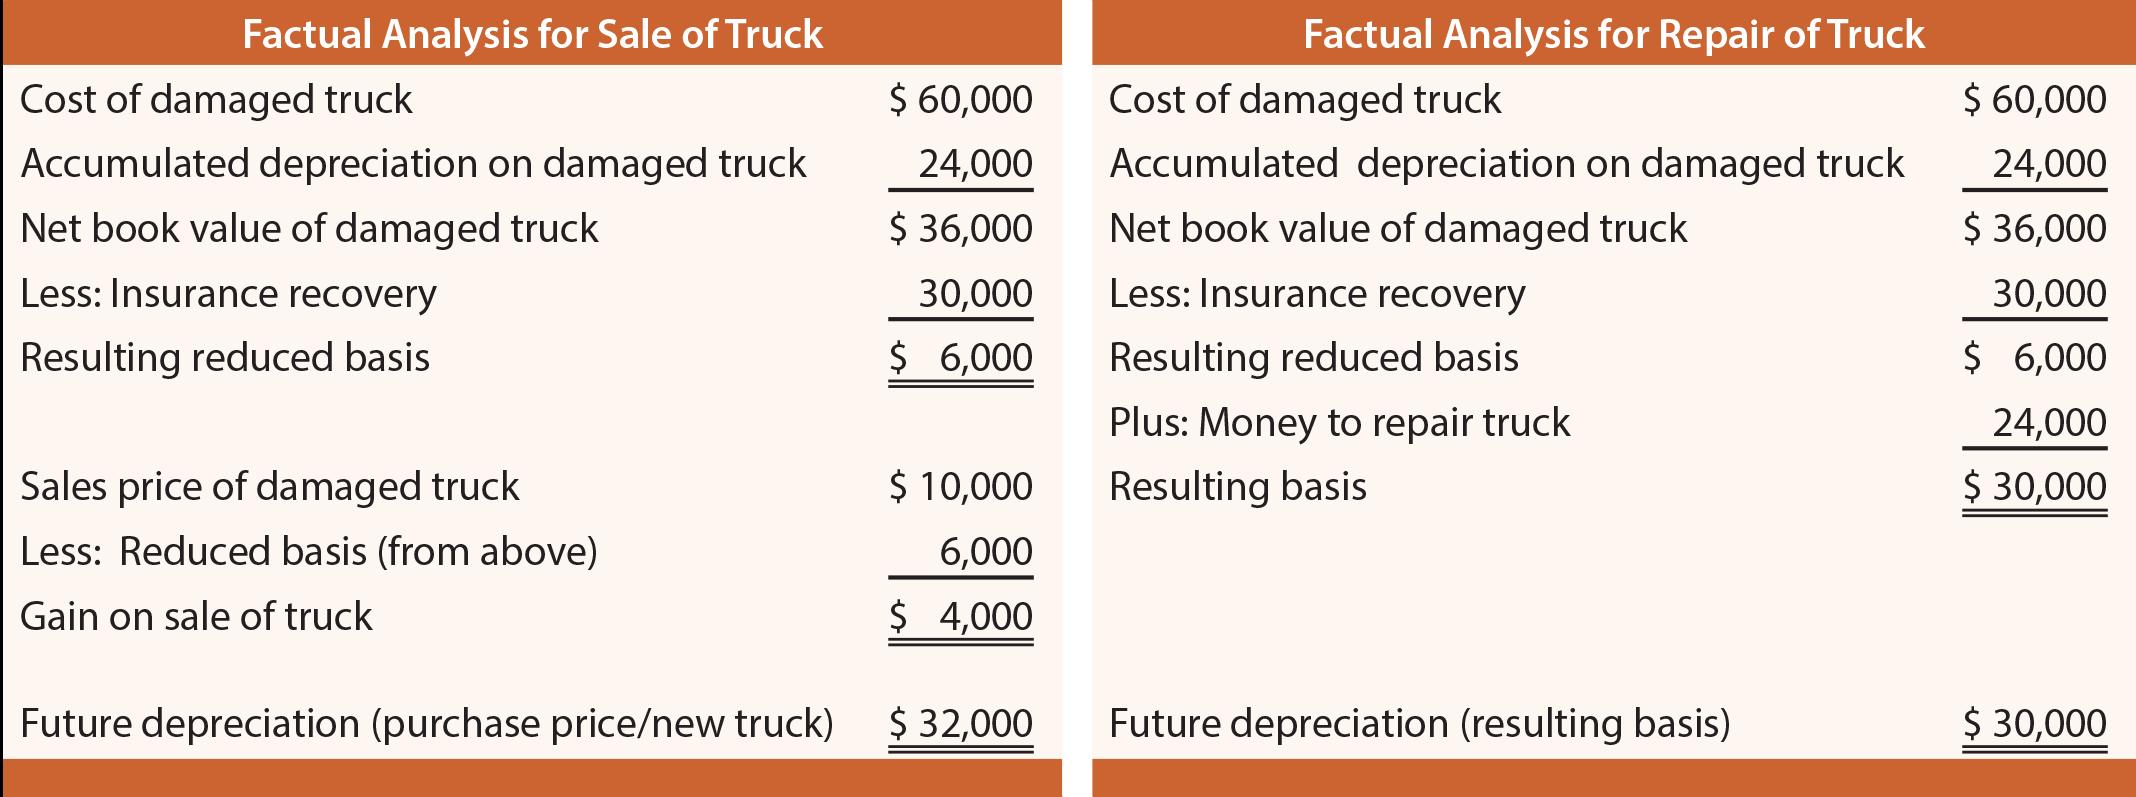 Factual Analysis of Truck